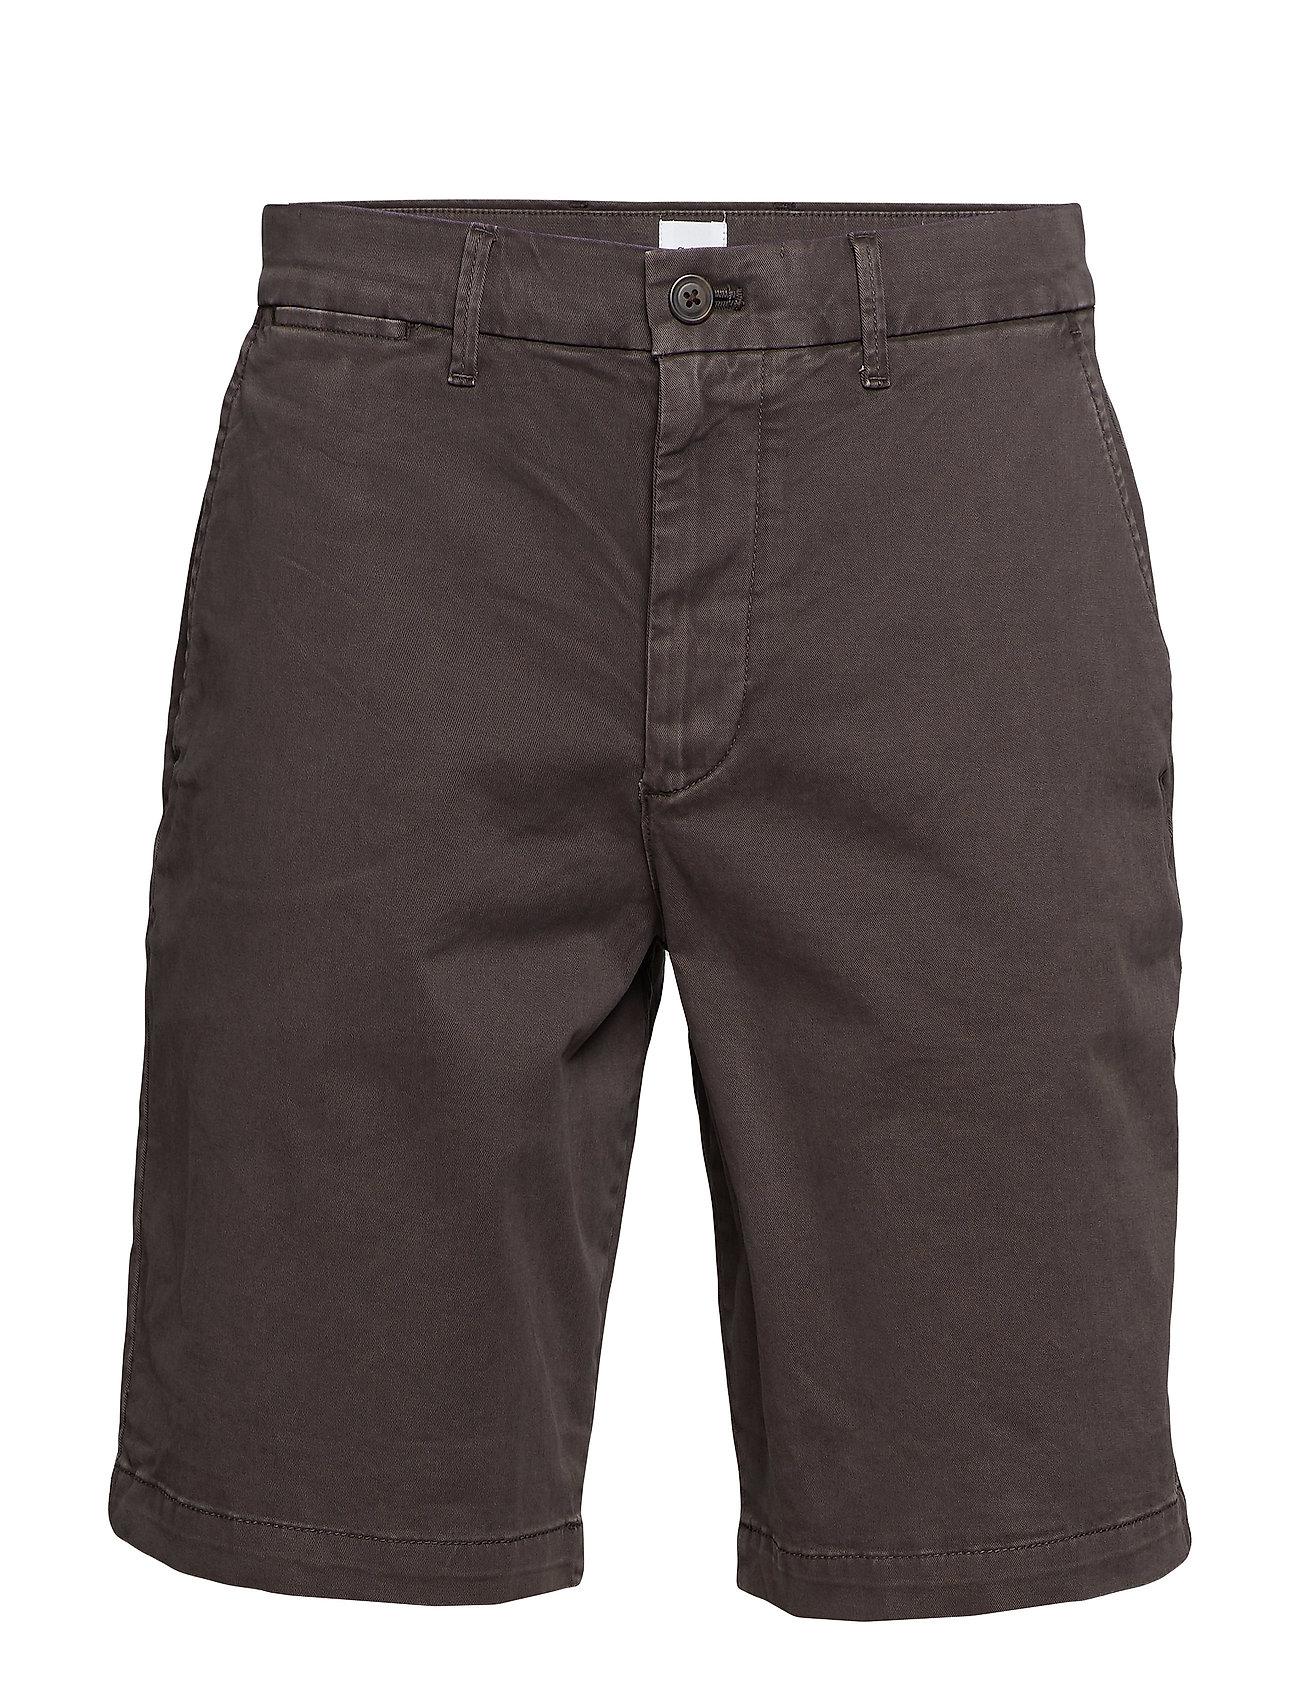 10 Vintage Khaki Shorts With Gapflex Shorts Chinos Shorts Harmaa GAP